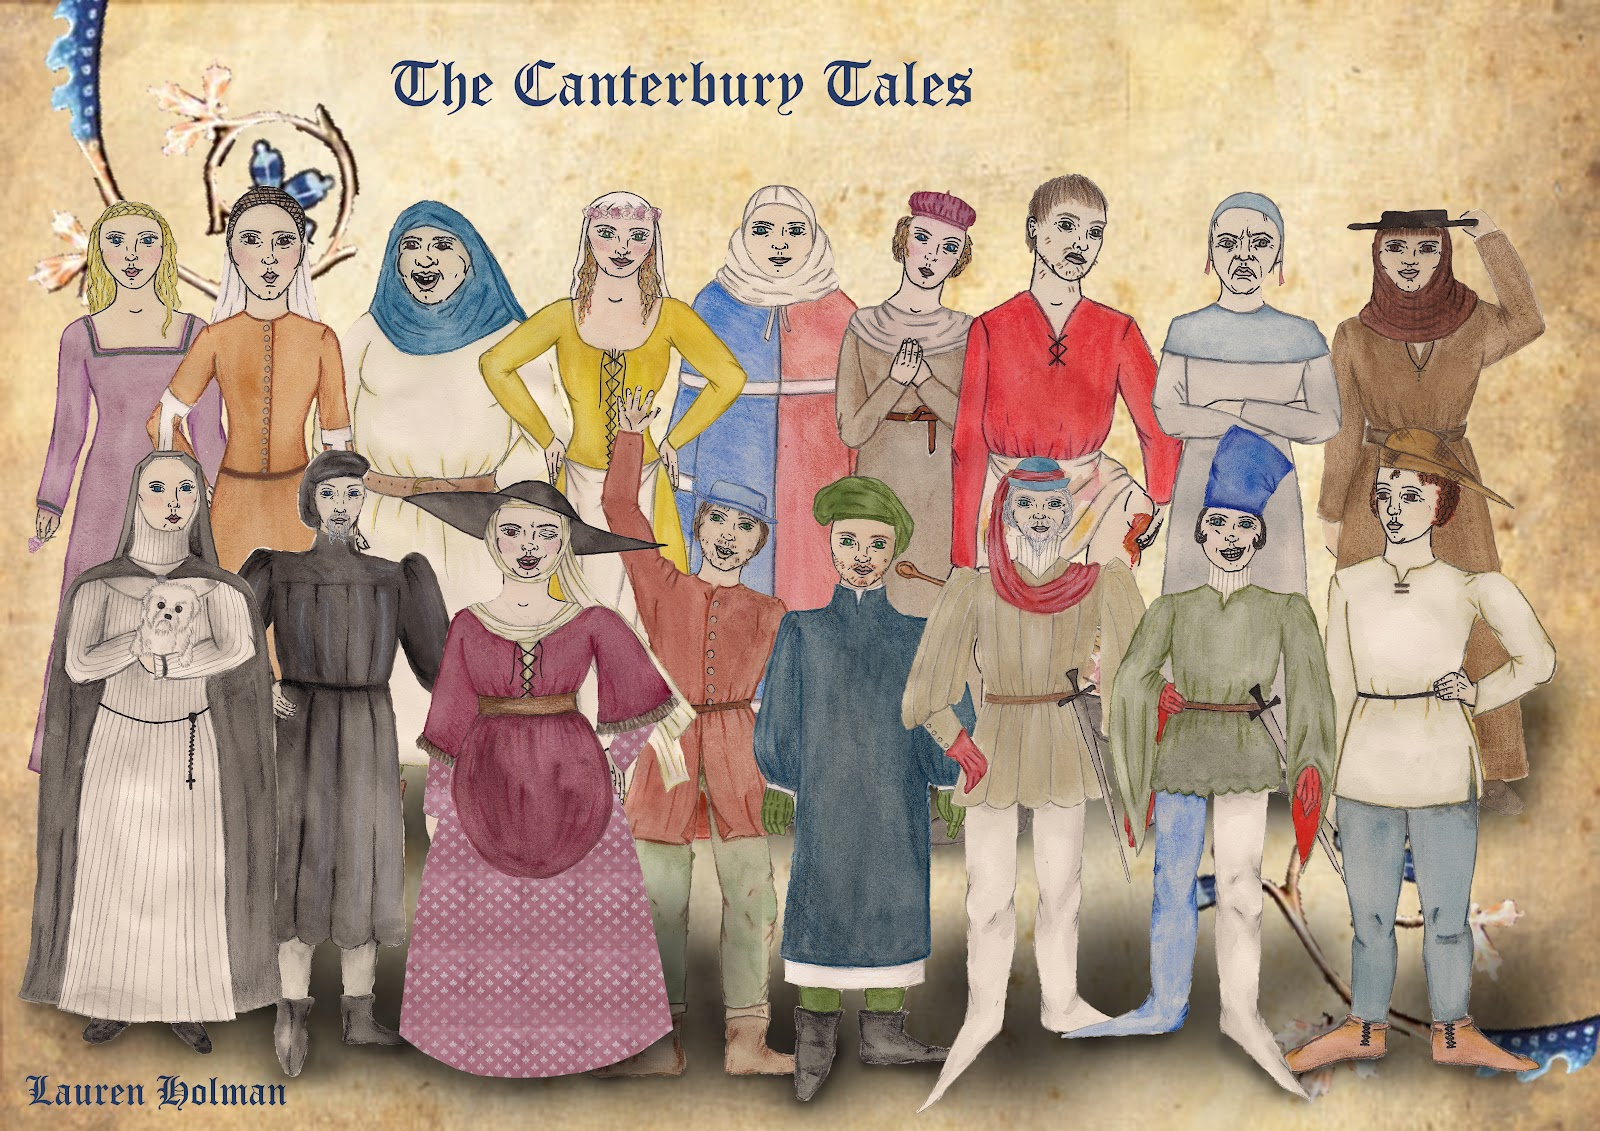 an analysis of canterbury wife of bath